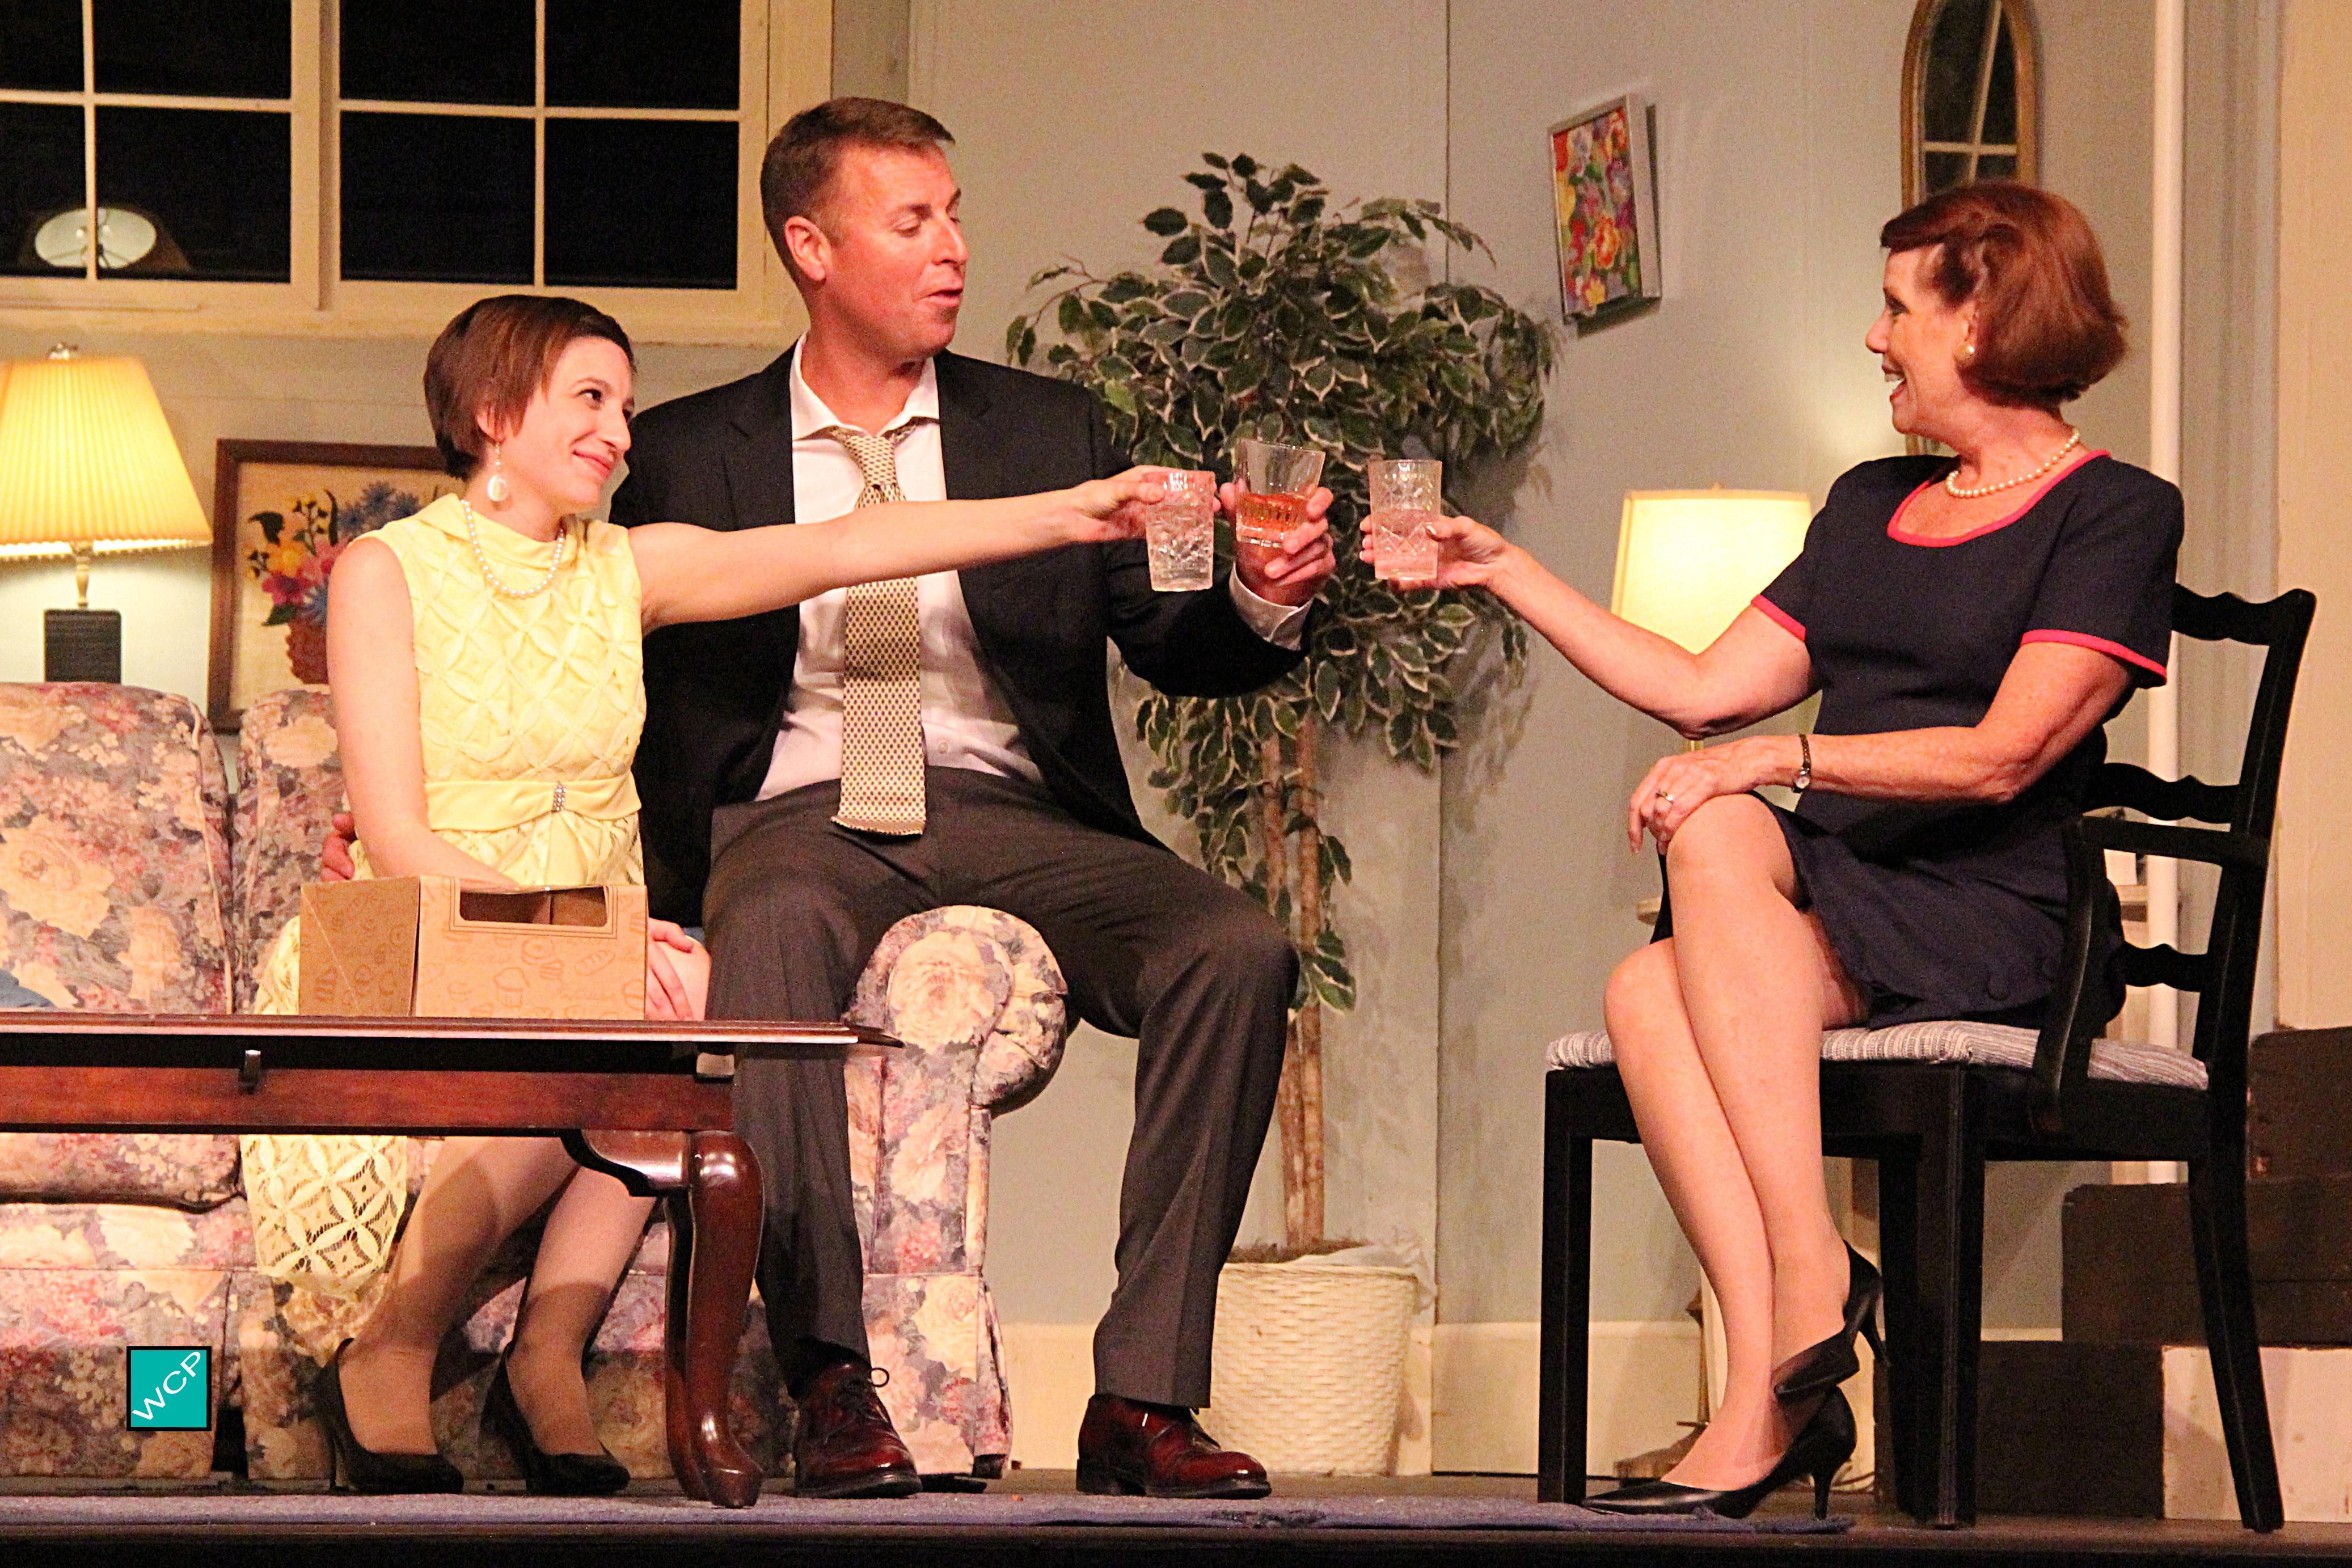 [l-r]Debbie Campanali as Corie, Brian Remo as Paul, Zita Geoffroy-Heinz as Mrs. Banks